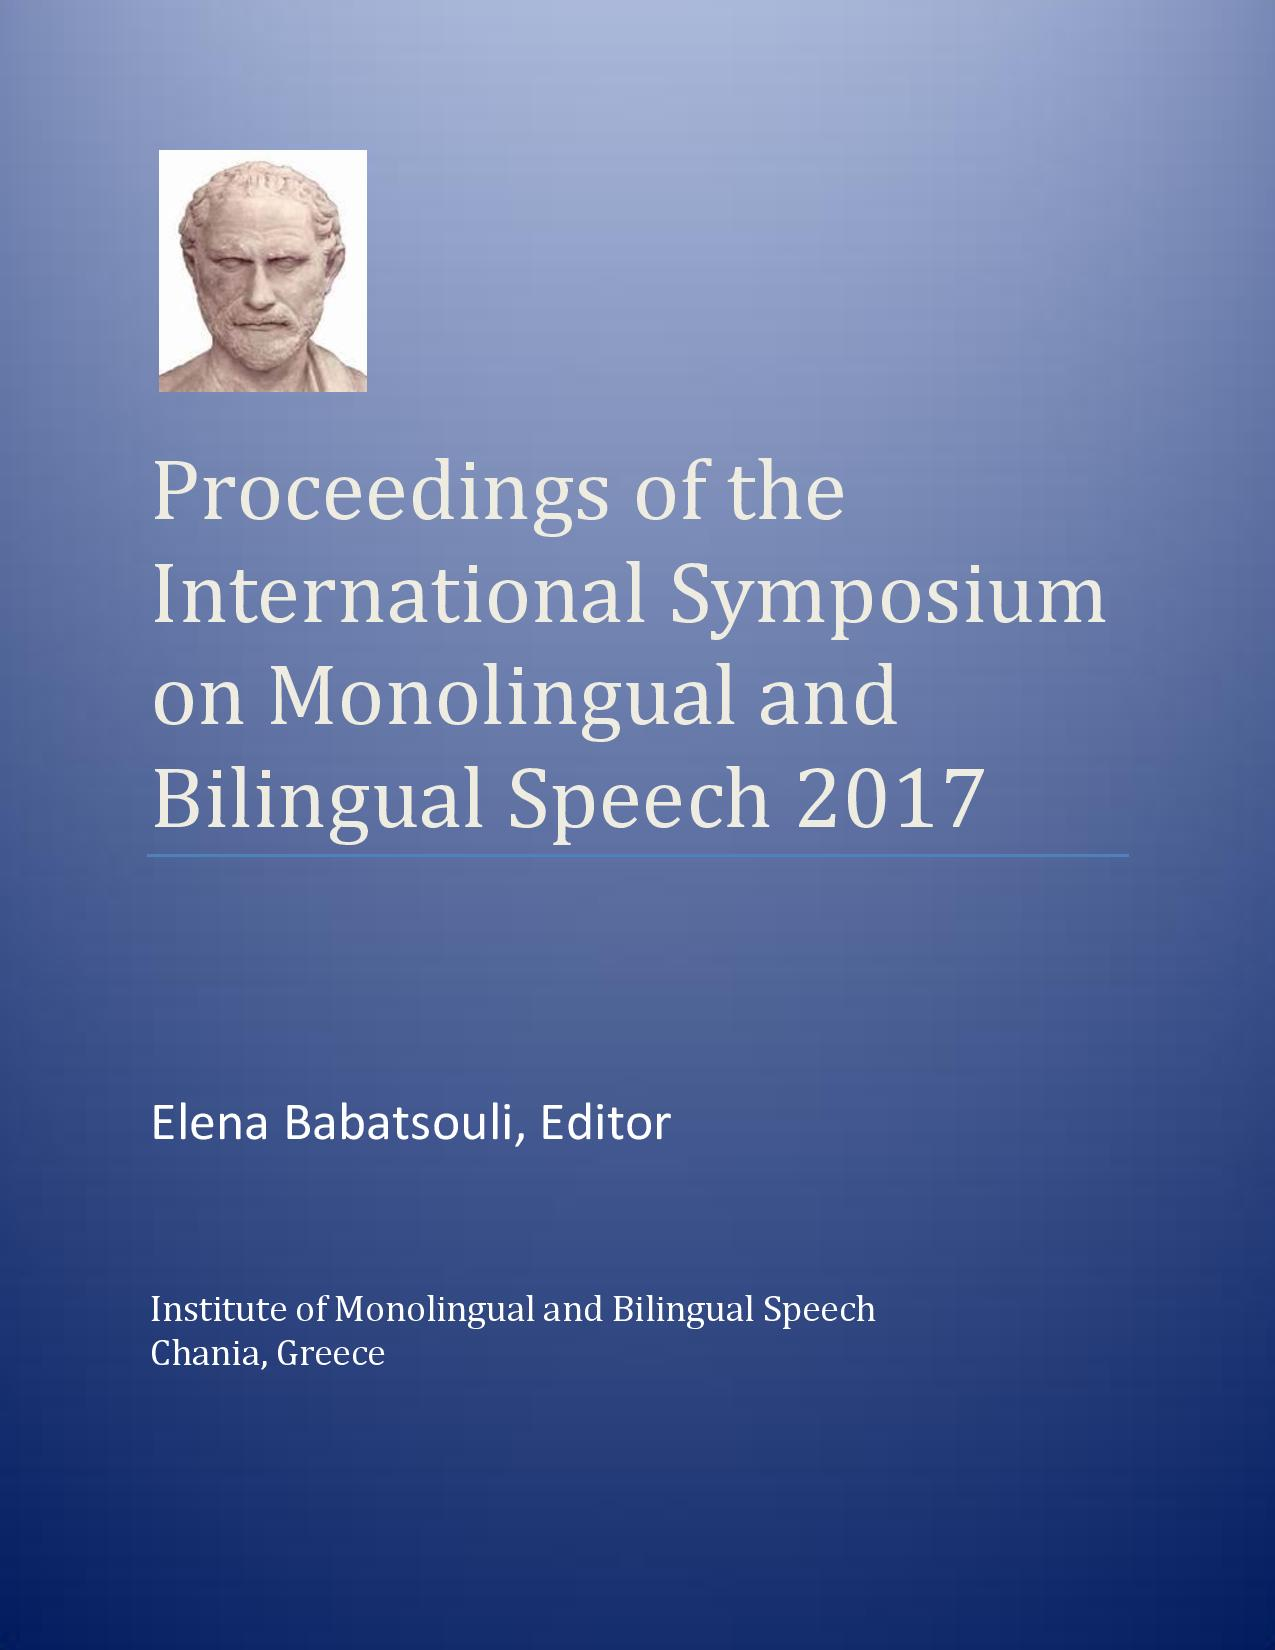 ISMBS 2017 Proceedings